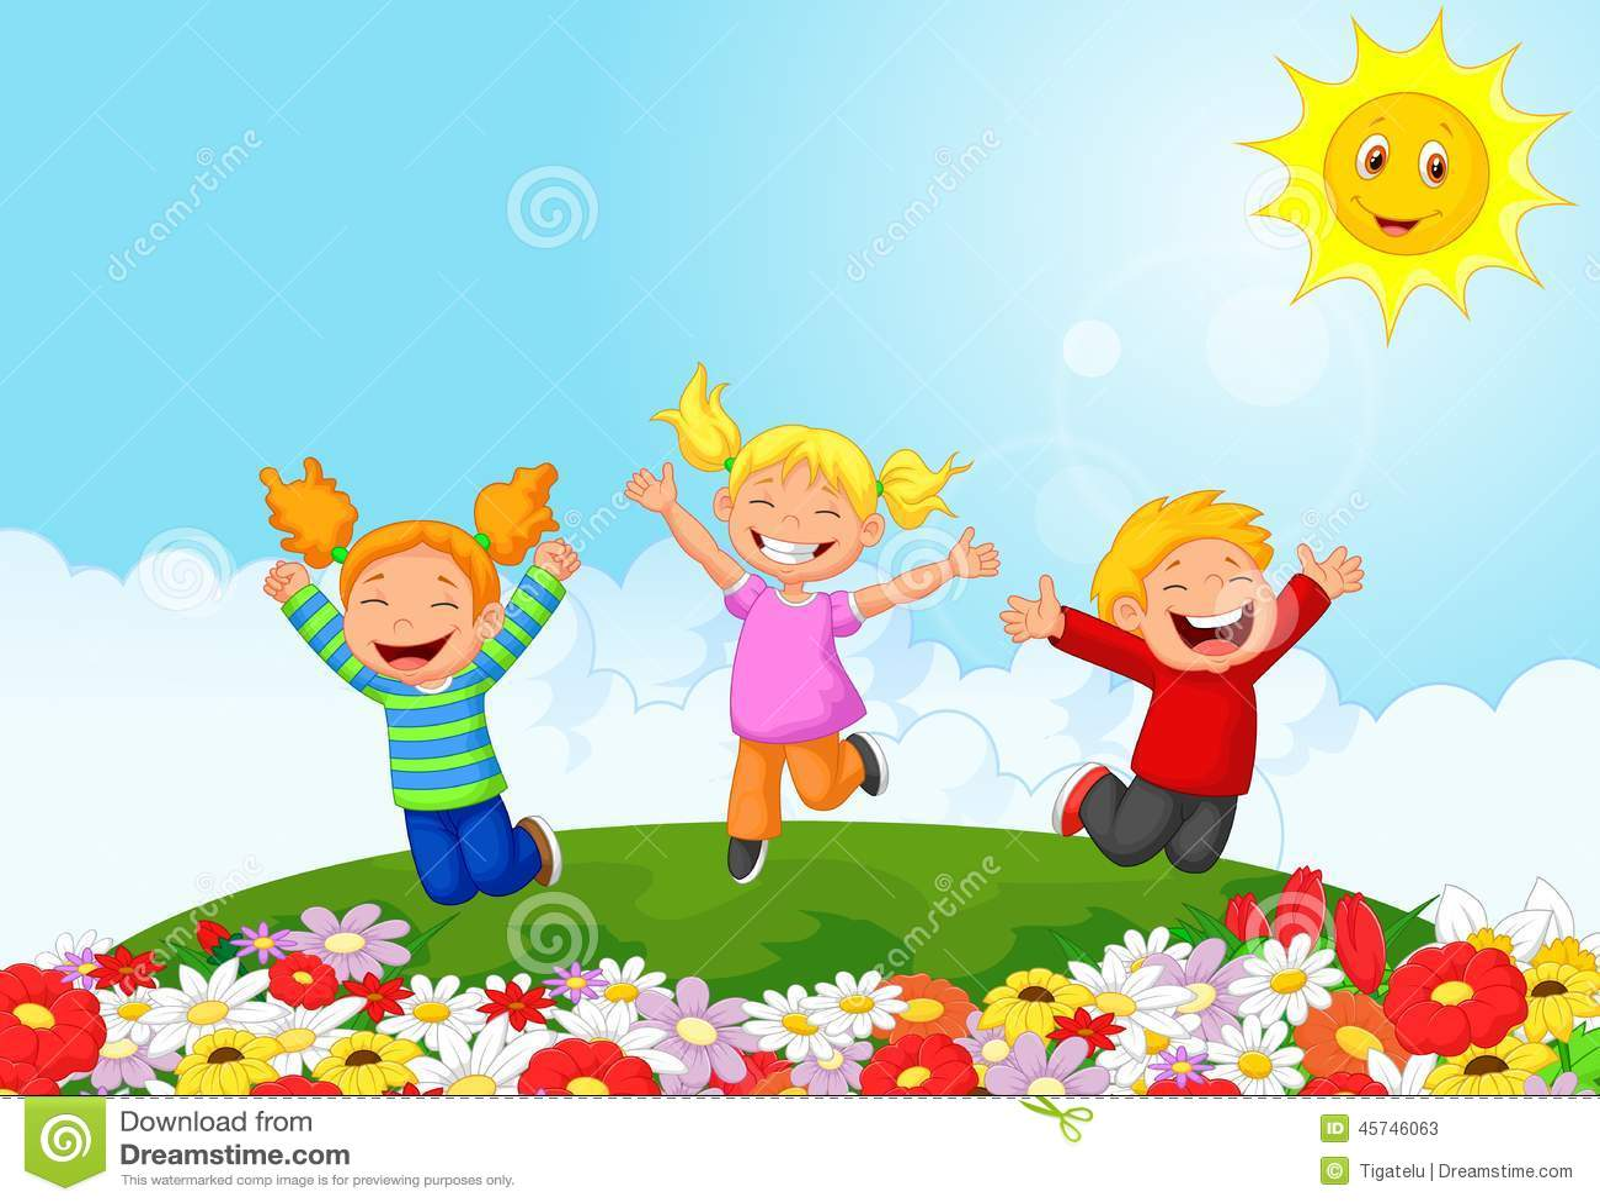 Happy kid cartoon stock vector. Illustration of child ...